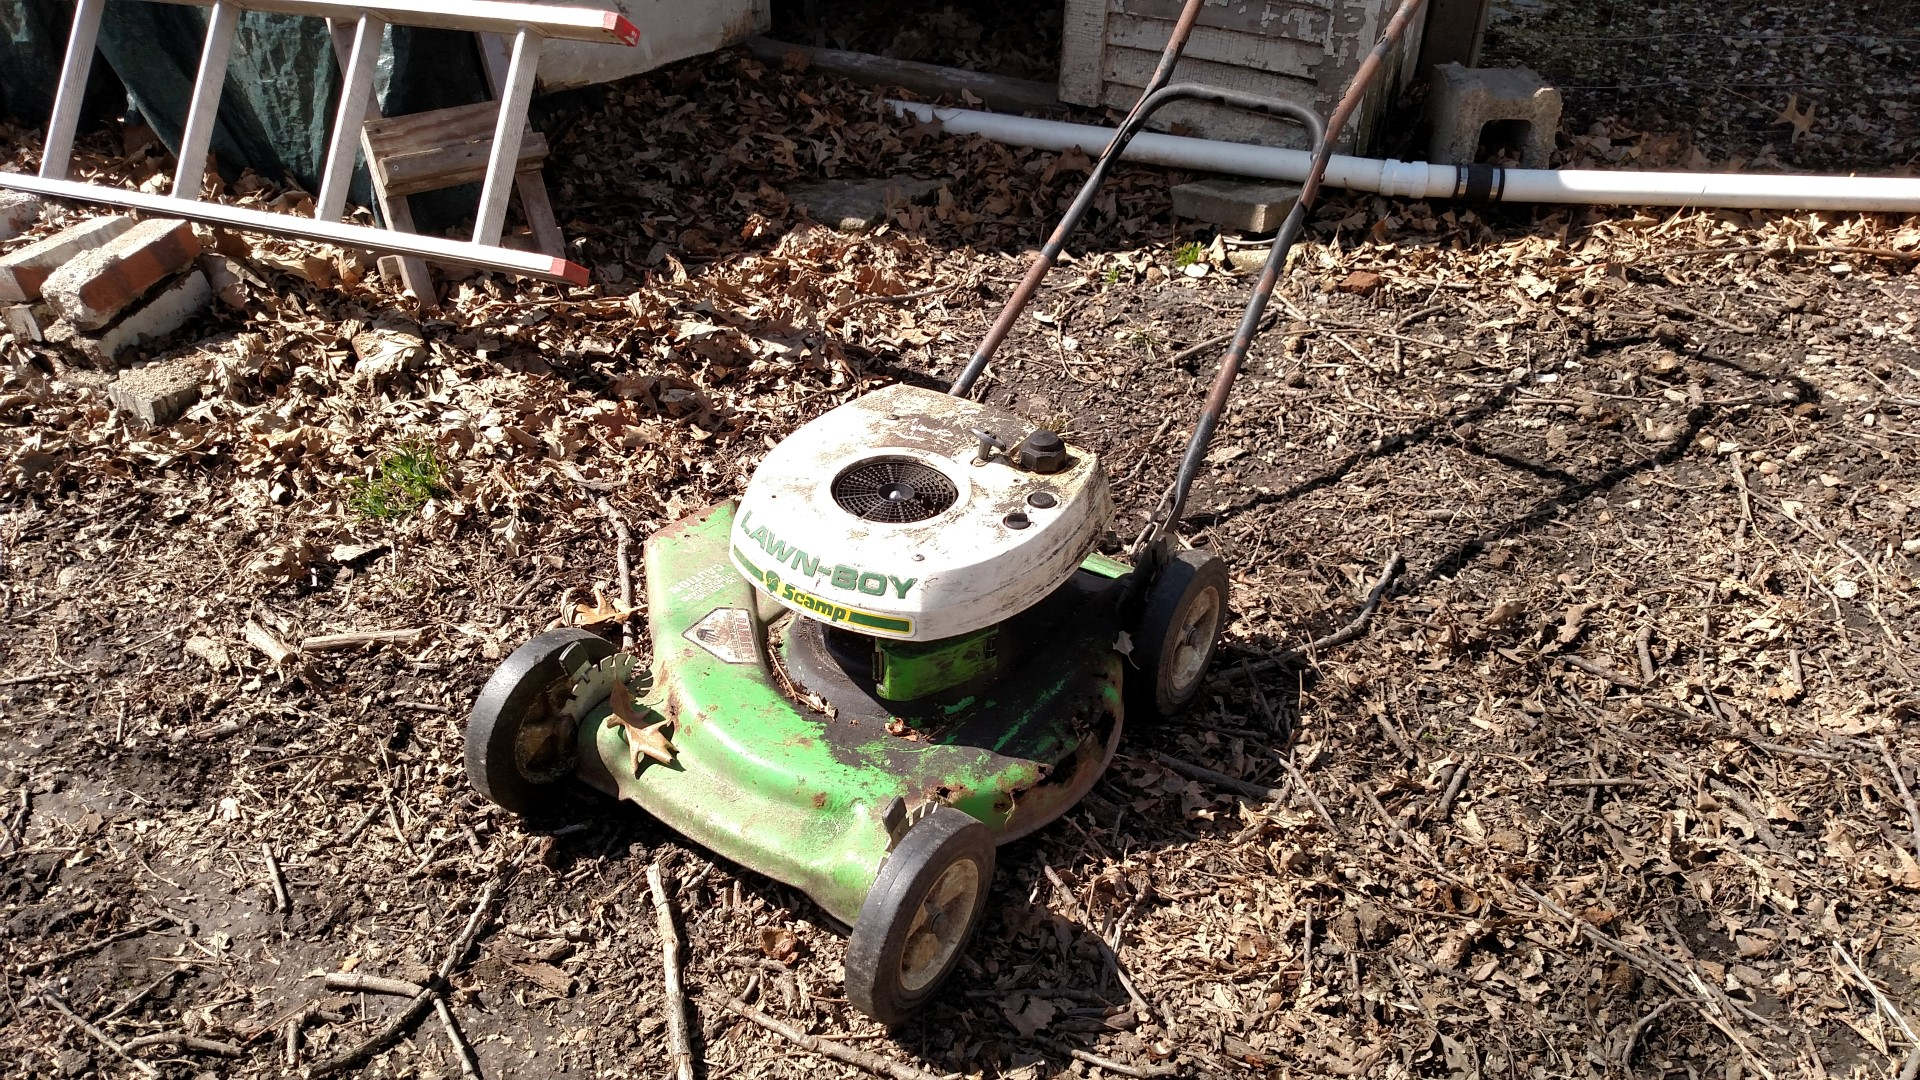 lawn boy scamp mytractorforumcom the friendliest tractor forum